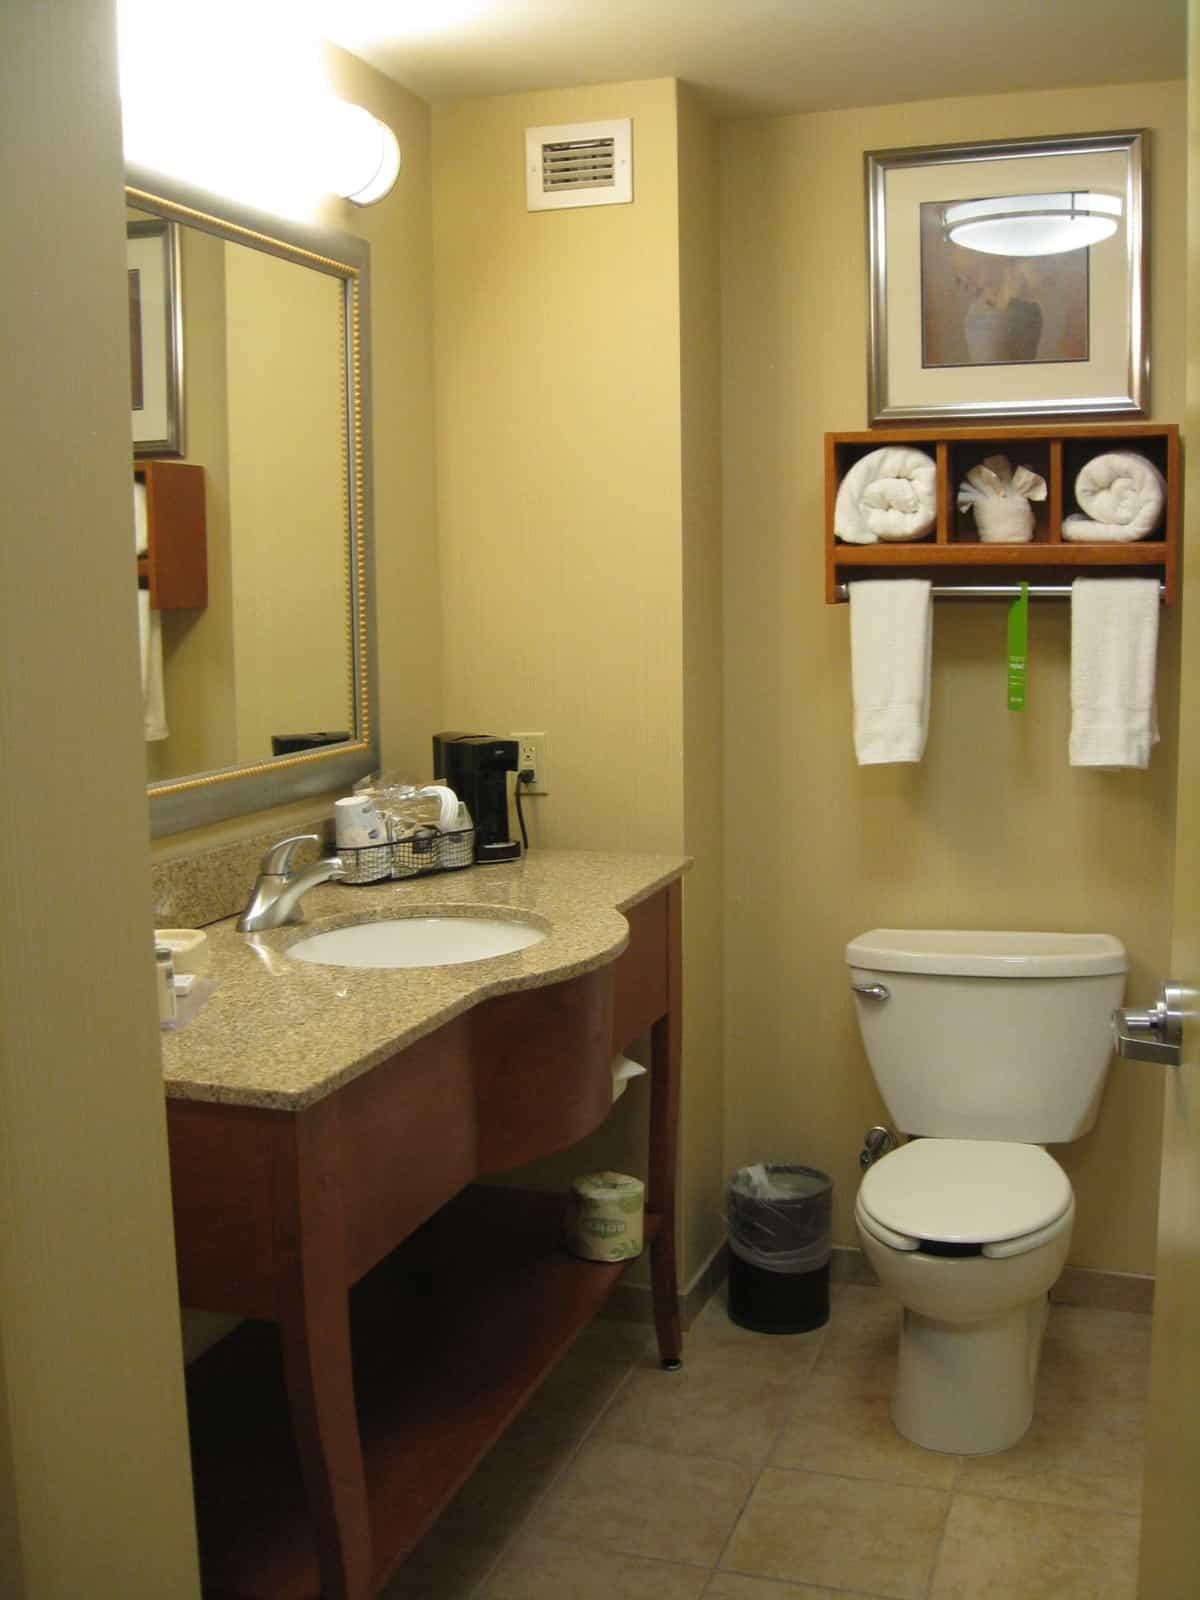 Room Planner Program Hampton Inn La Guardia Airport Room Bathroom Traveling